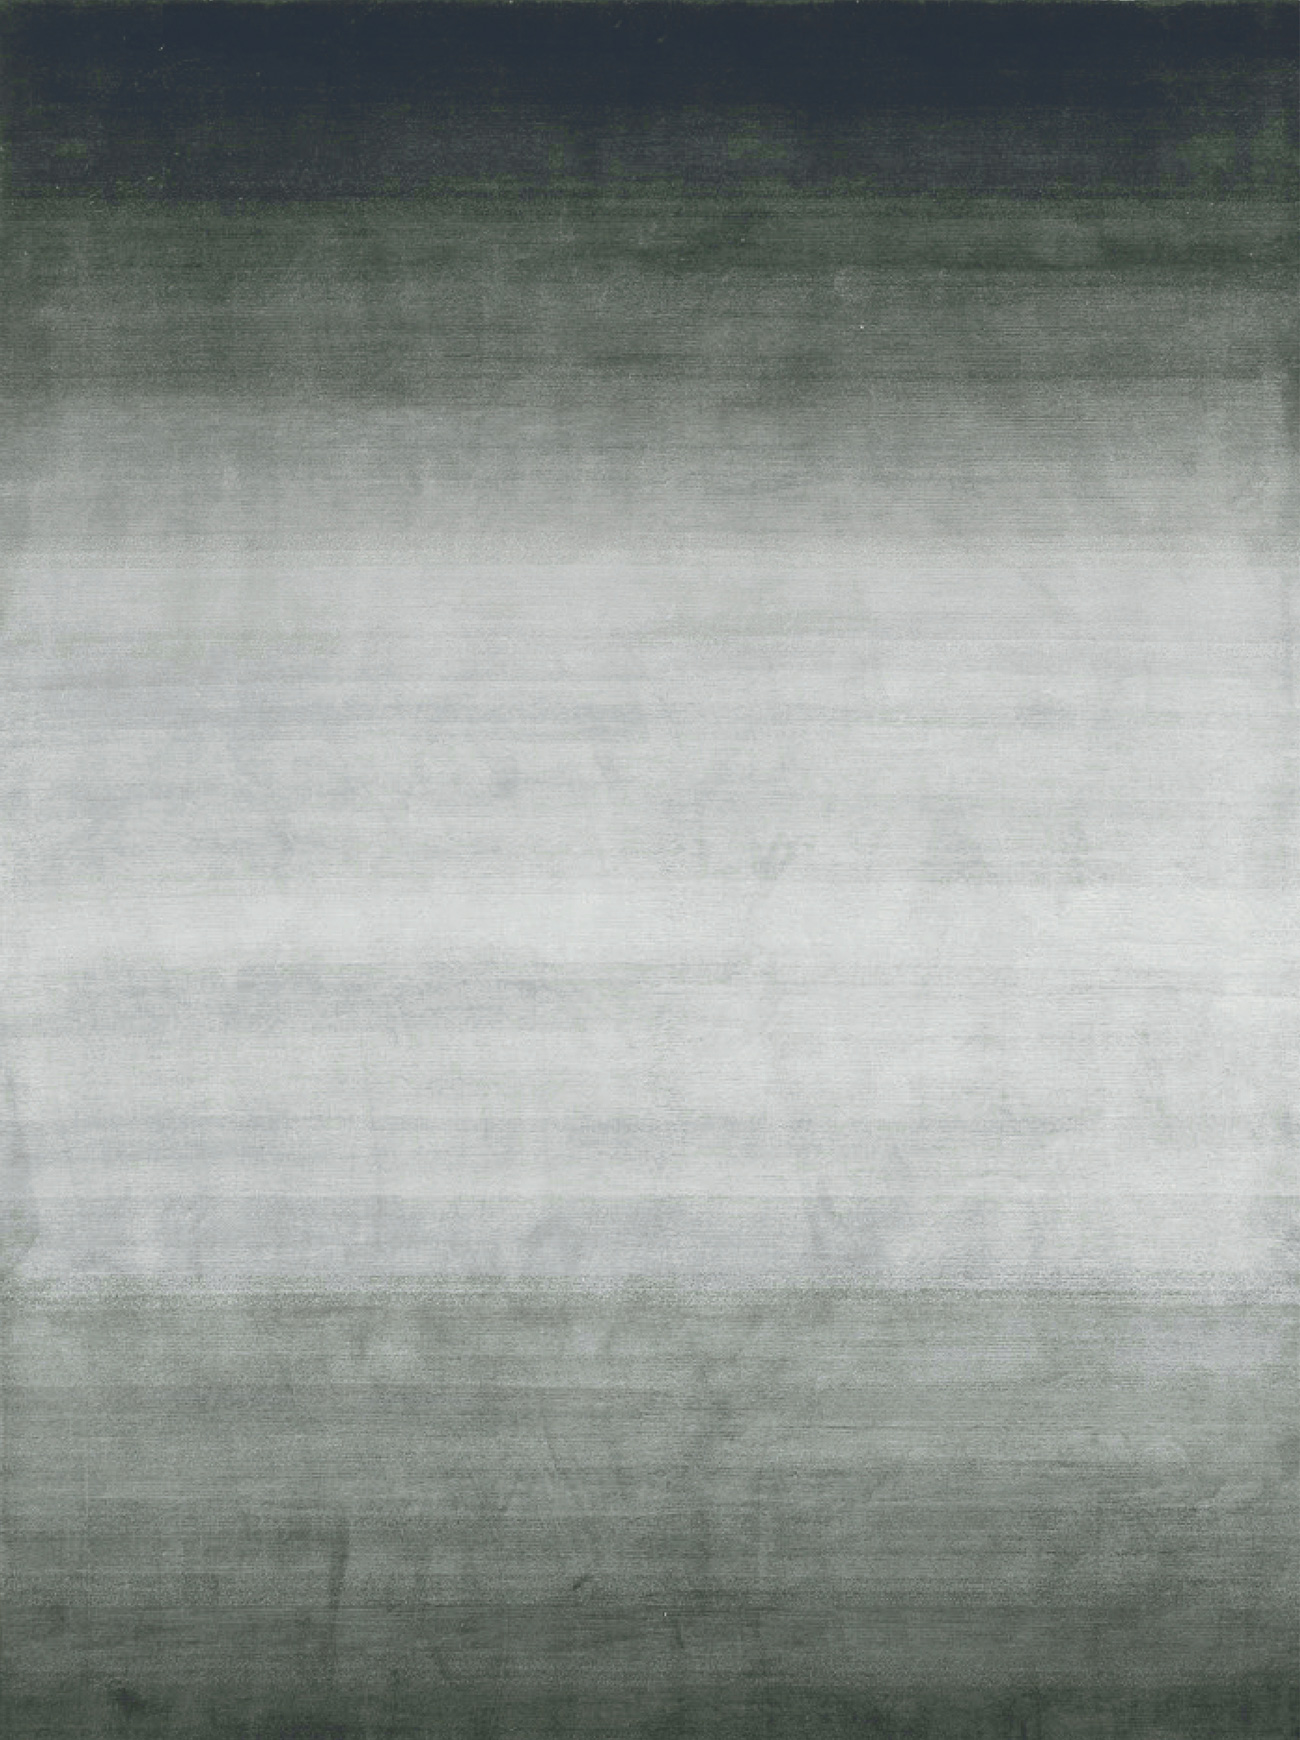 Poliform_tappeti_SOFT_01_finiture_1300x1740px